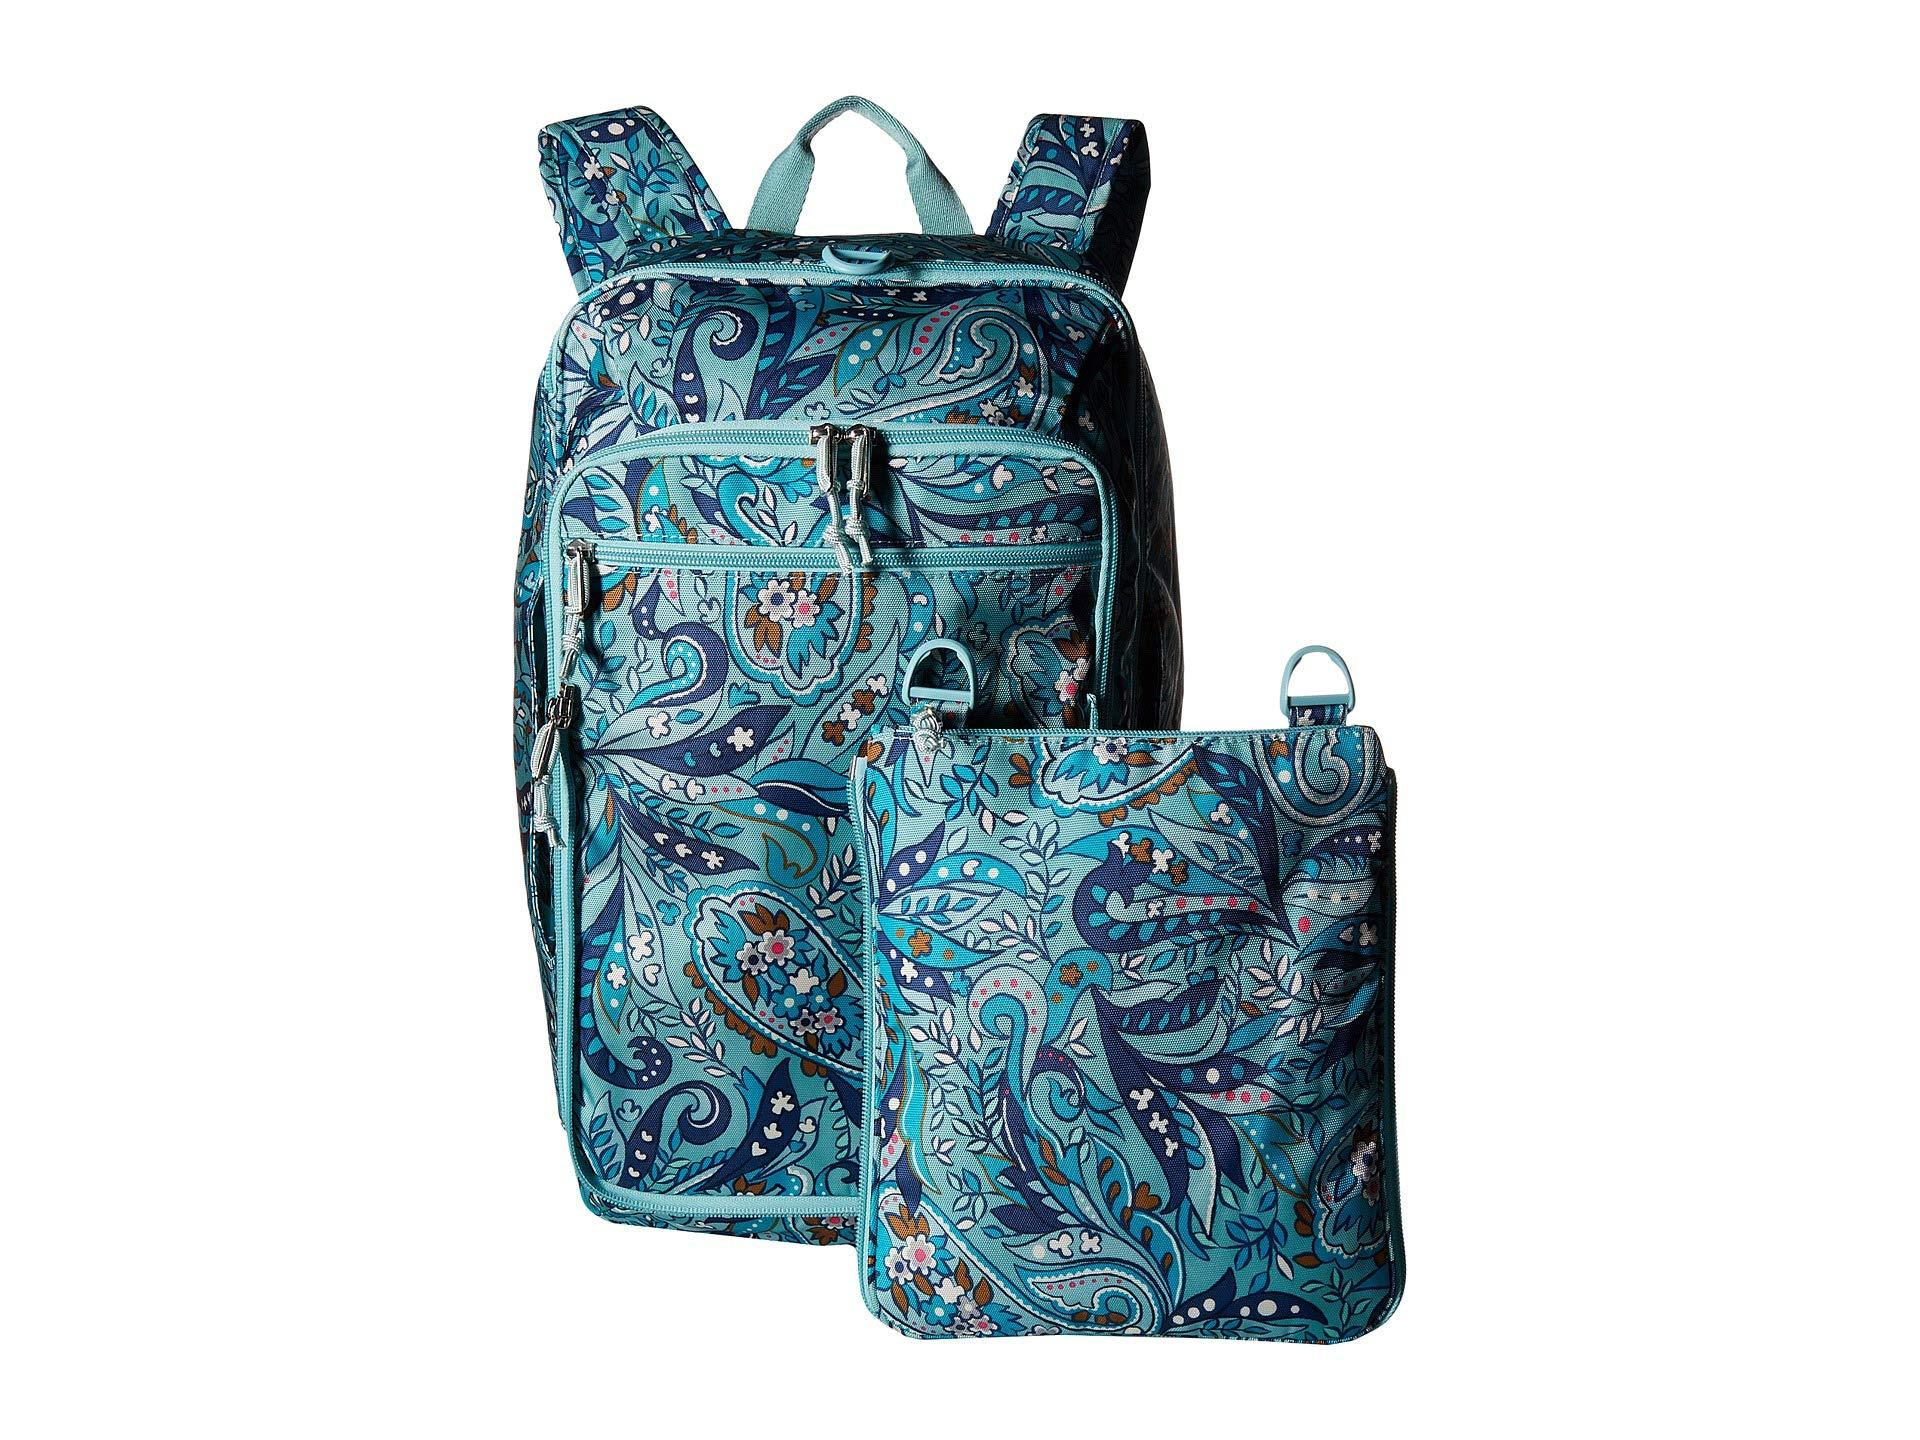 Convertible Lighten Vera Travel Daisy Paisley Bag Up Bradley TRTqwtZ